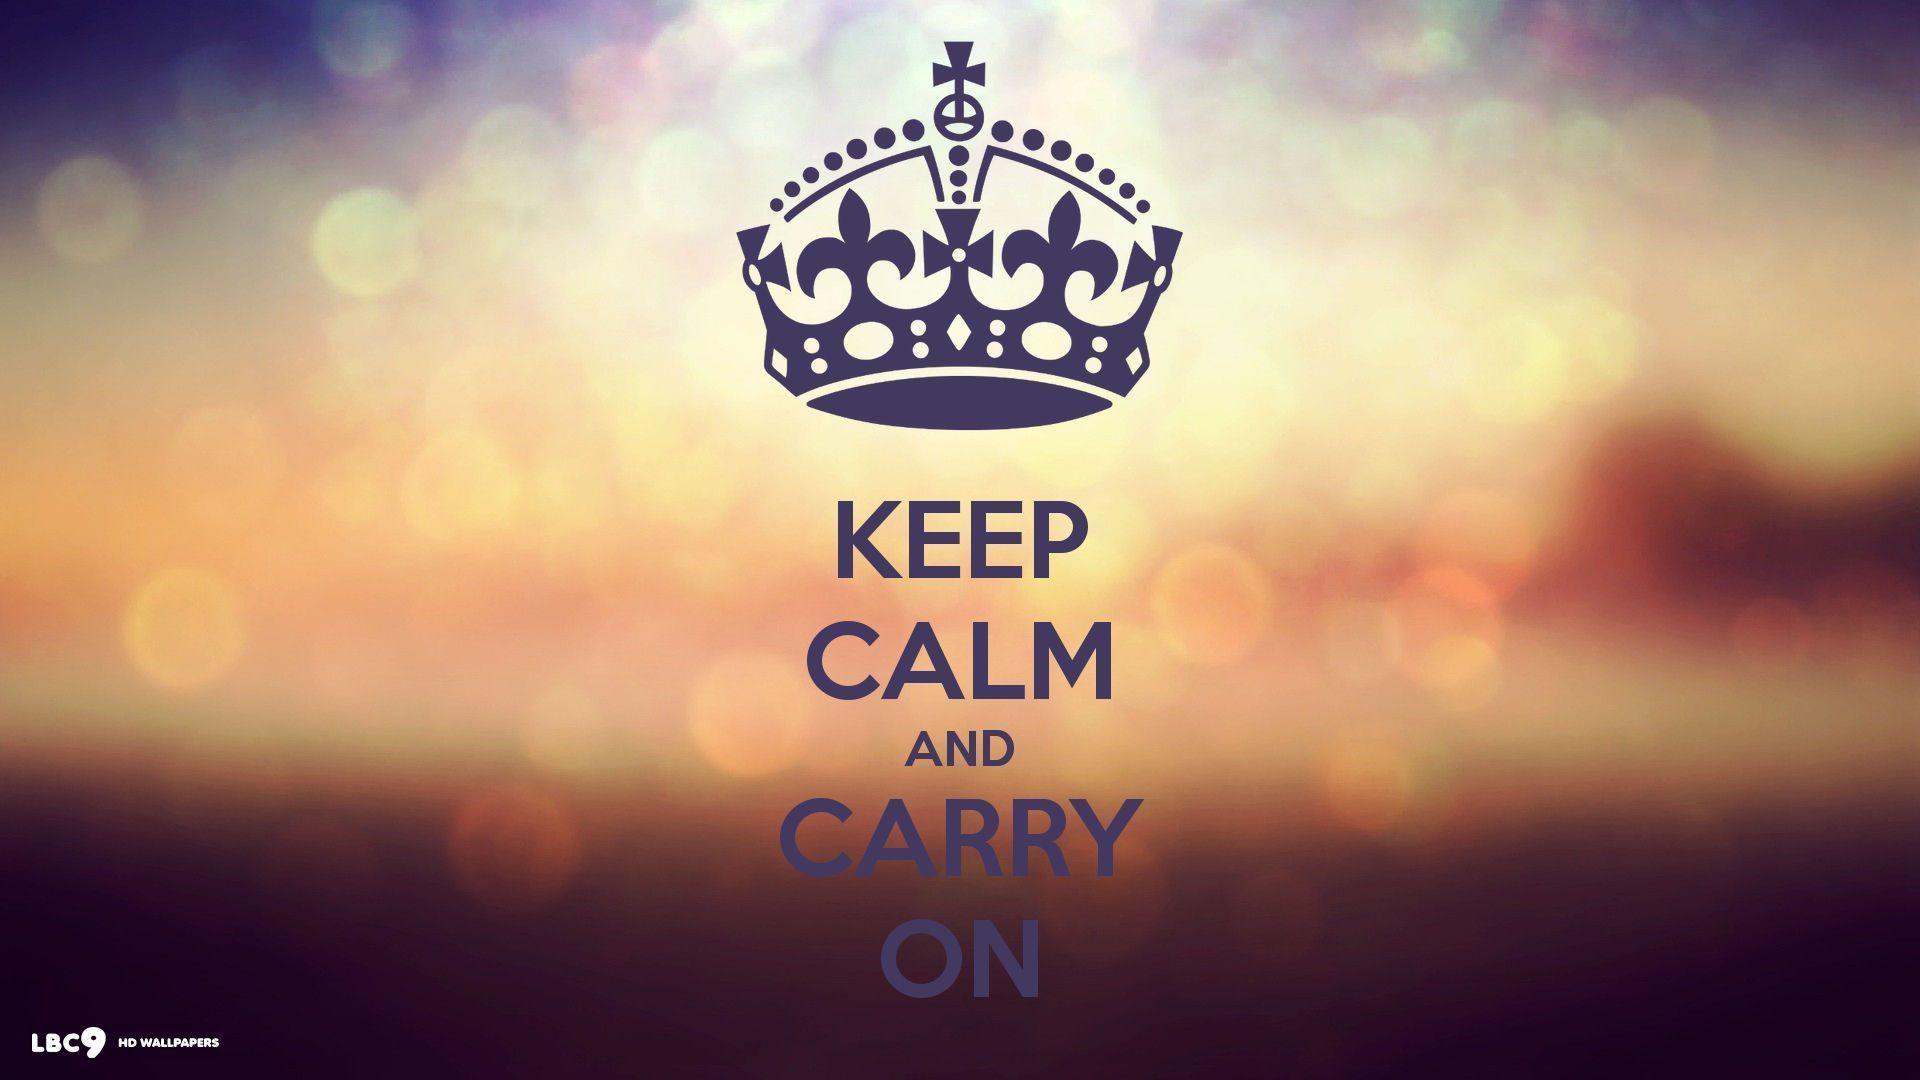 Full Hd P Calm Wallpapers Hd Desktop Backgrounds X Keep Calm Pictures Keep Calm Images Keep Calm Wallpaper